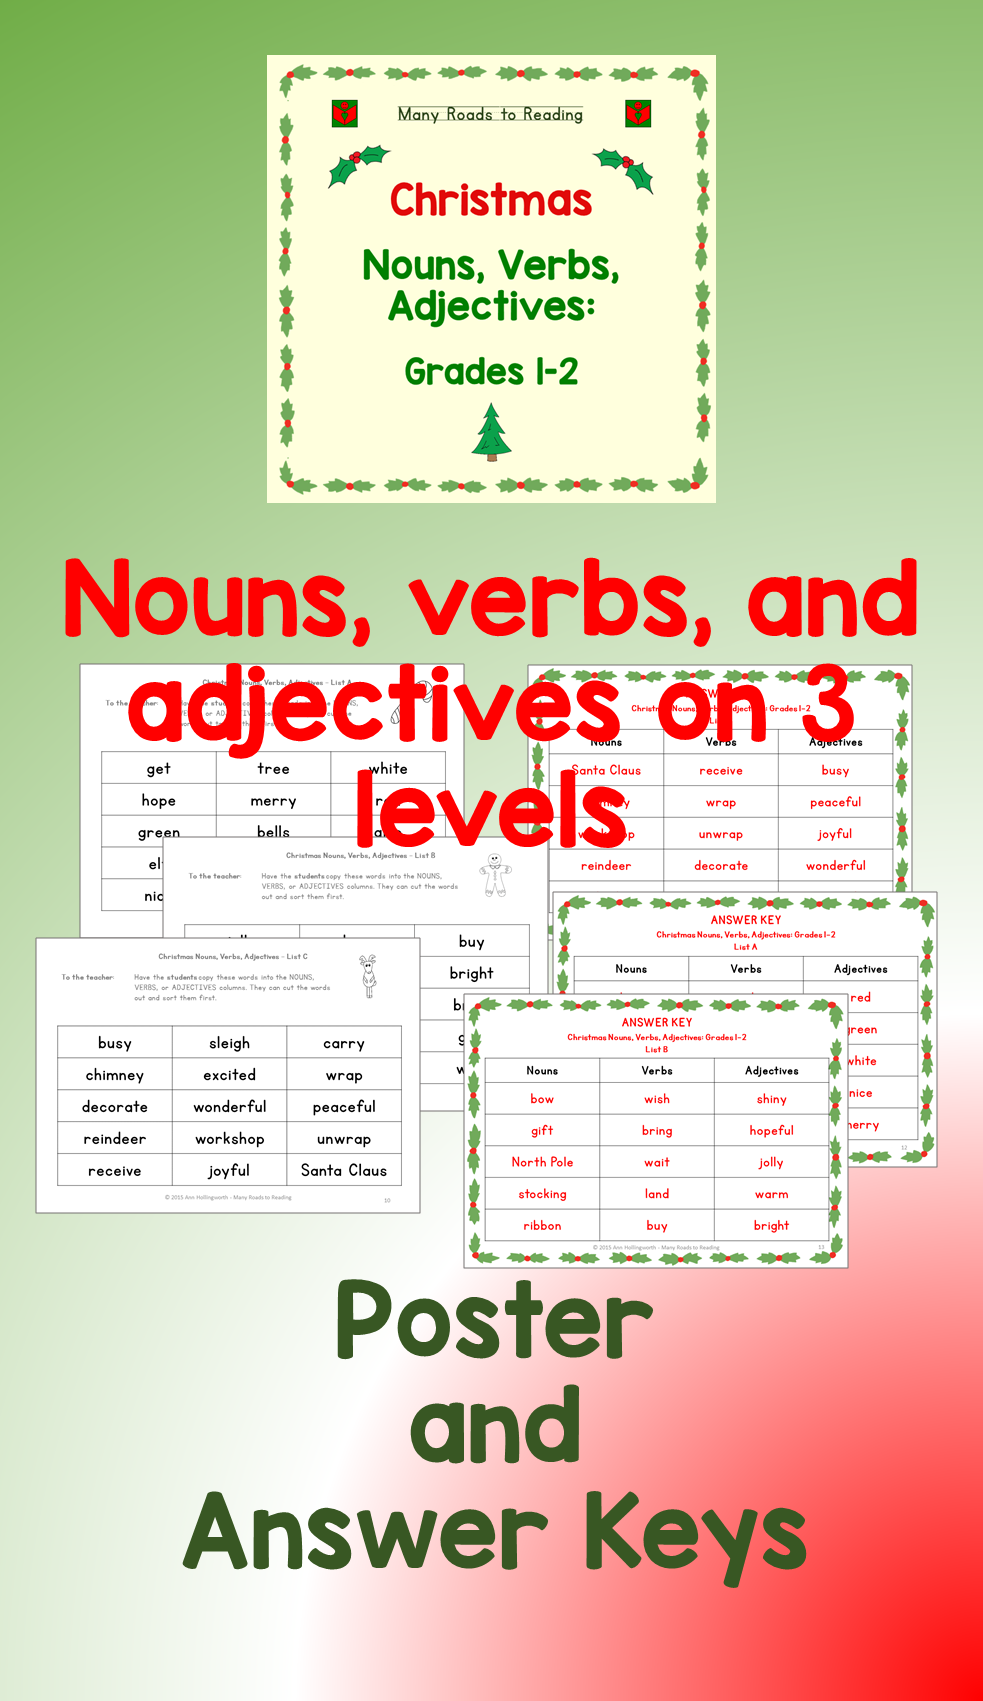 Workbooks nouns verbs adjectives worksheets : Christmas Nouns, Verbs, Adjectives: Grades 1-2 | Reading resources ...